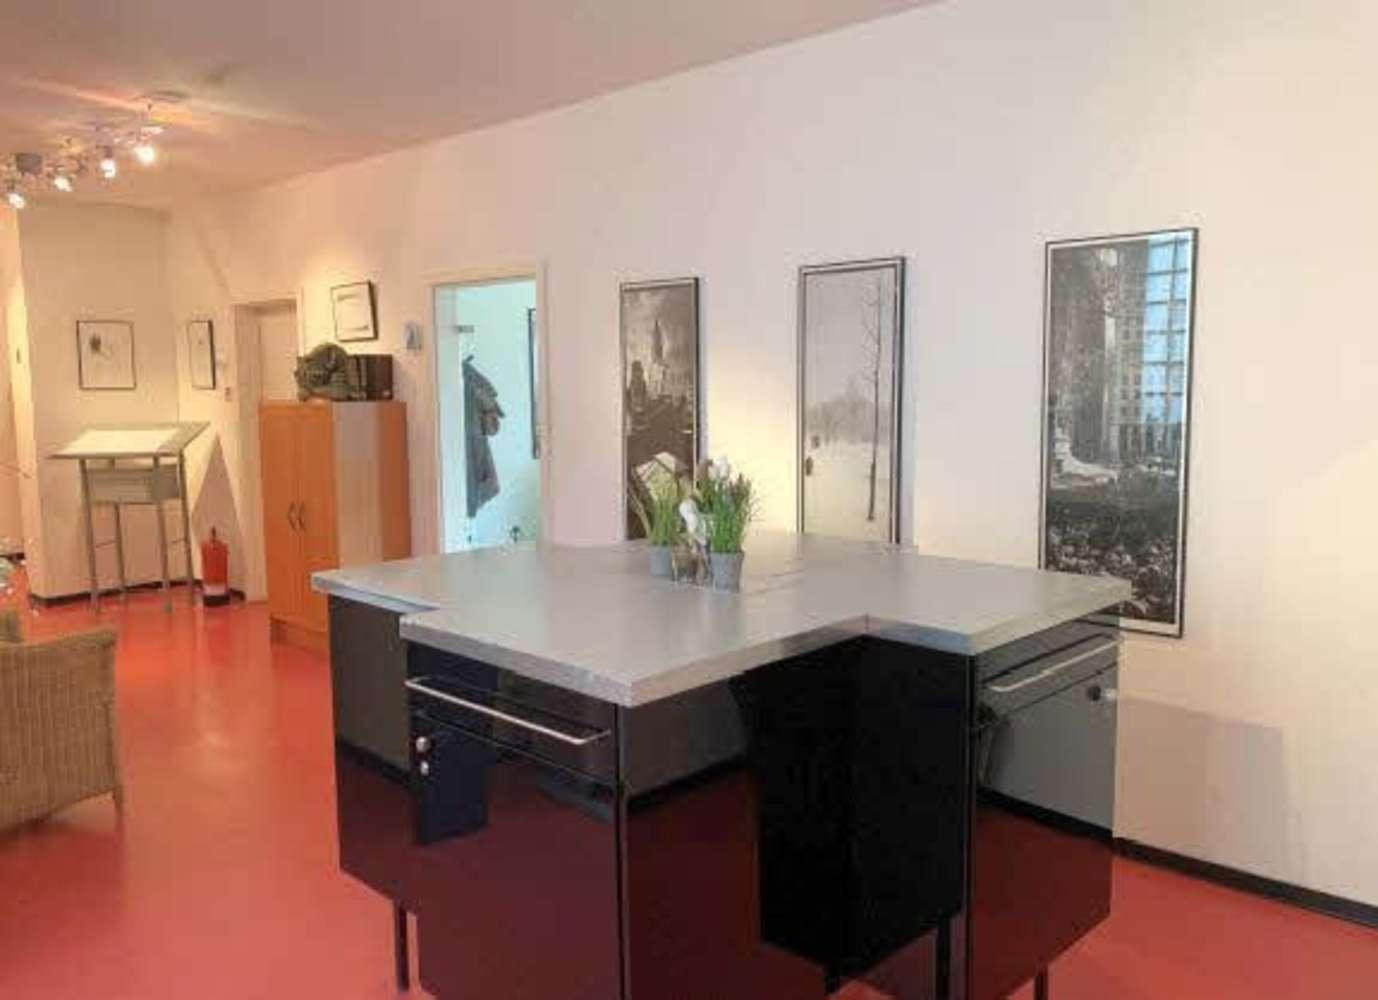 Büros Frankfurt am main, 60311 - Büro - Frankfurt am Main - F2602 - 10020784